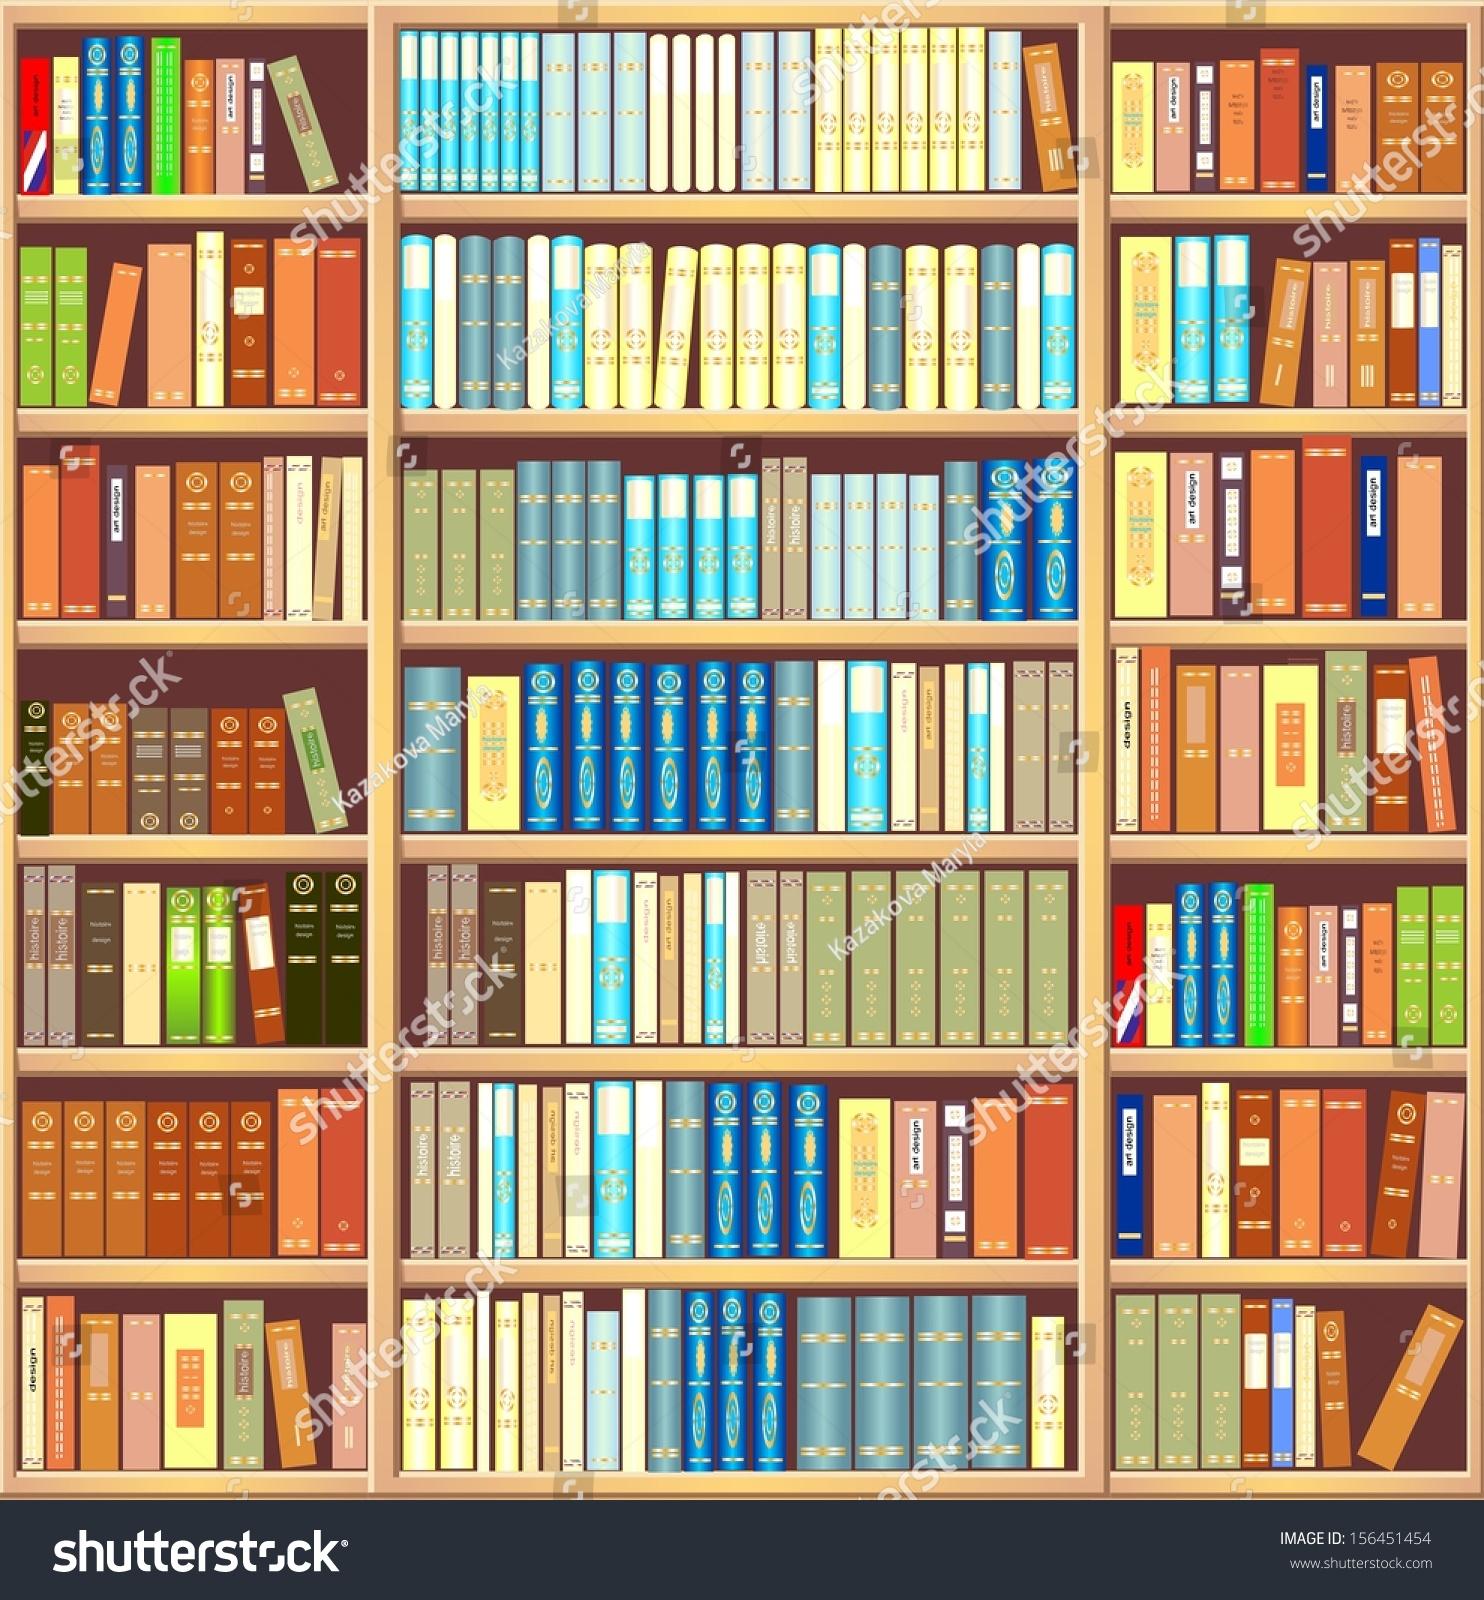 Bookcase full of books.